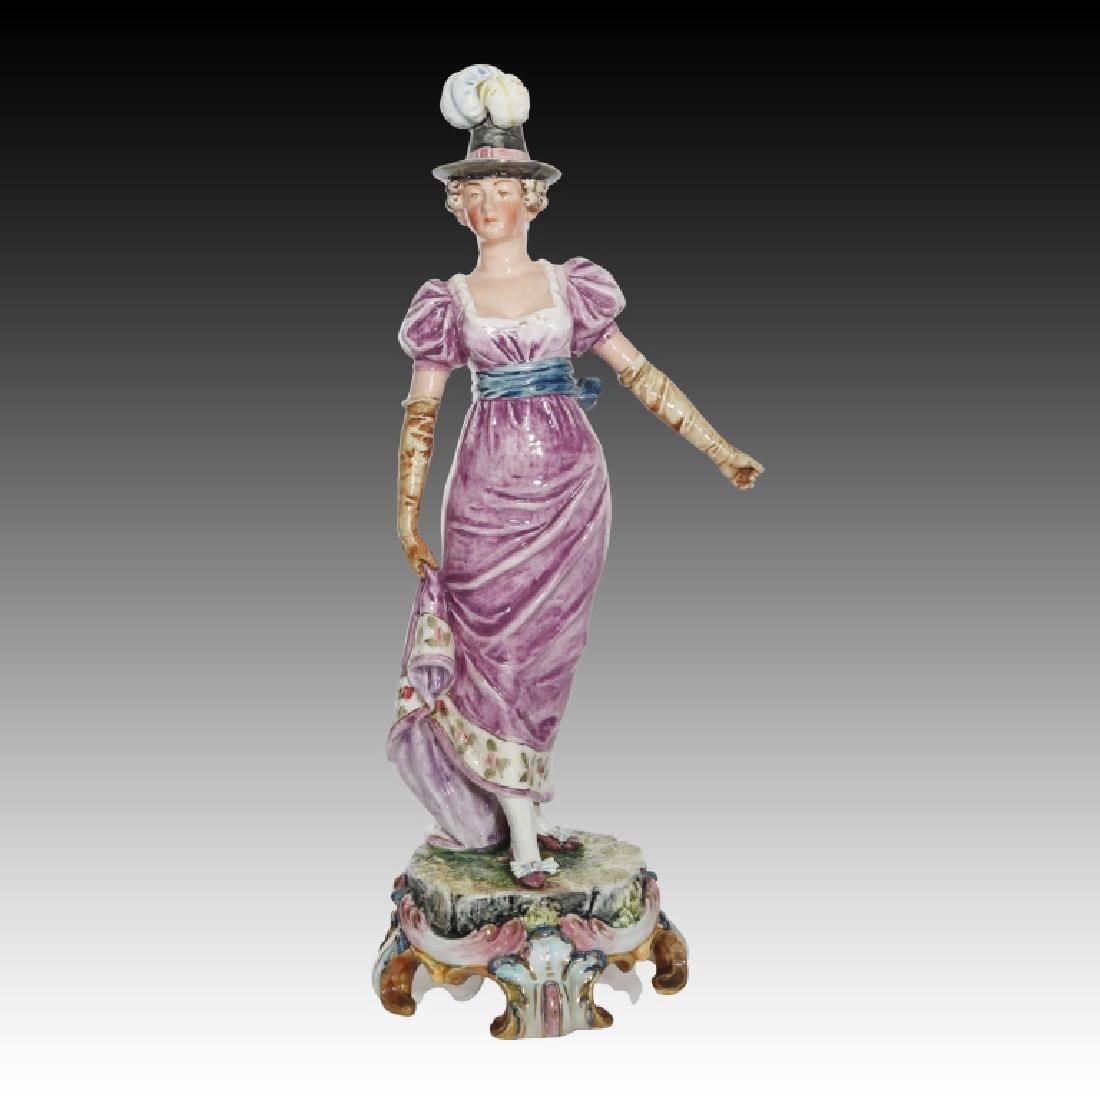 Majolica Figural Pair of Women in Regency Dress - 6